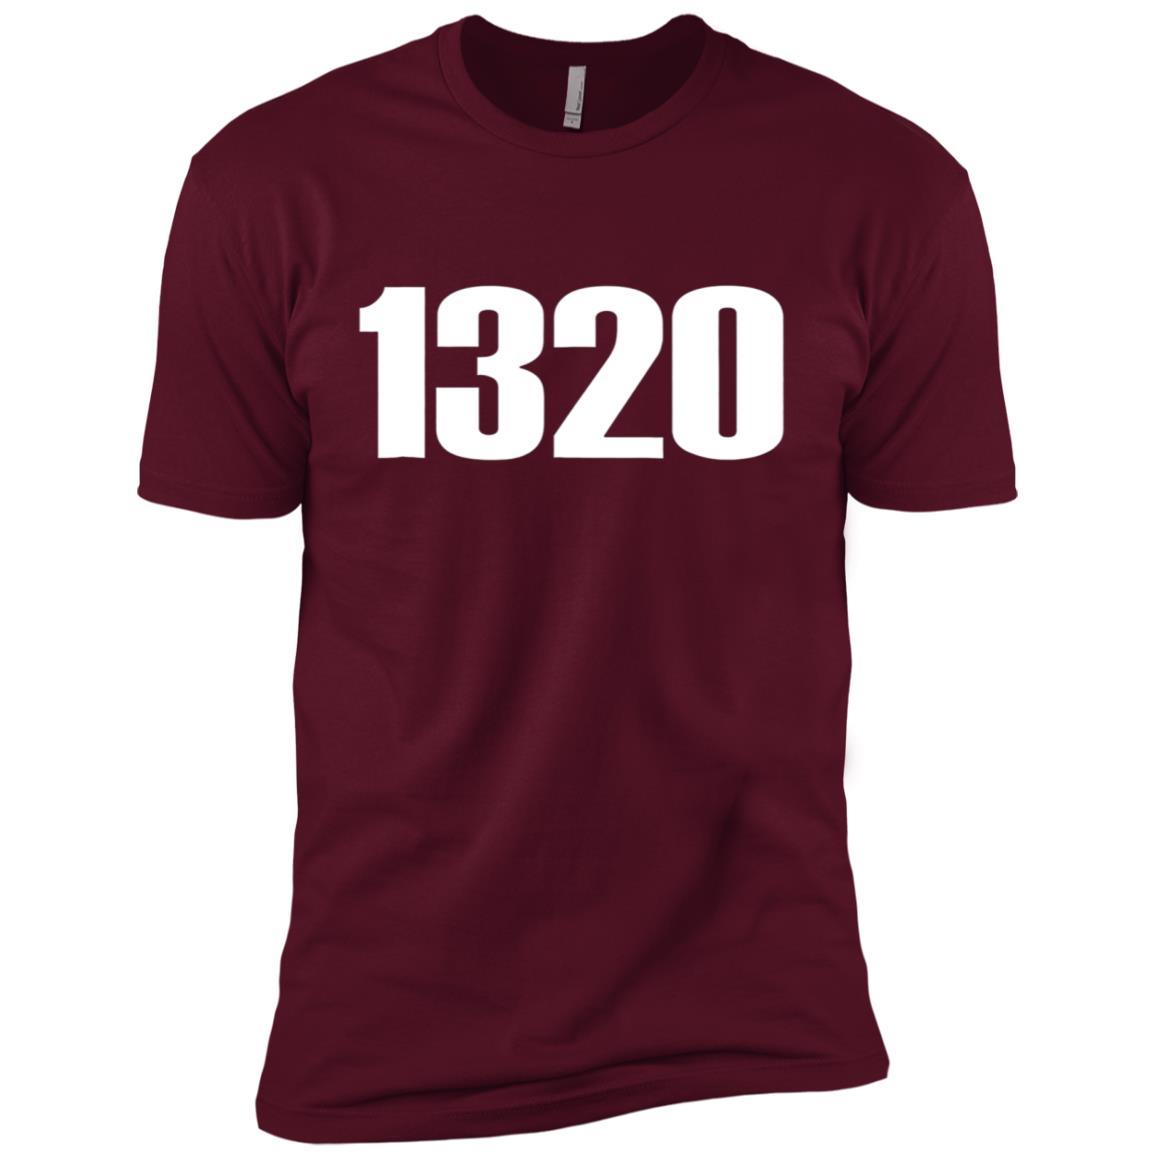 1320 Drag Racing Quarter Mile Car Enthusiast Men Short Sleeve T-Shirt